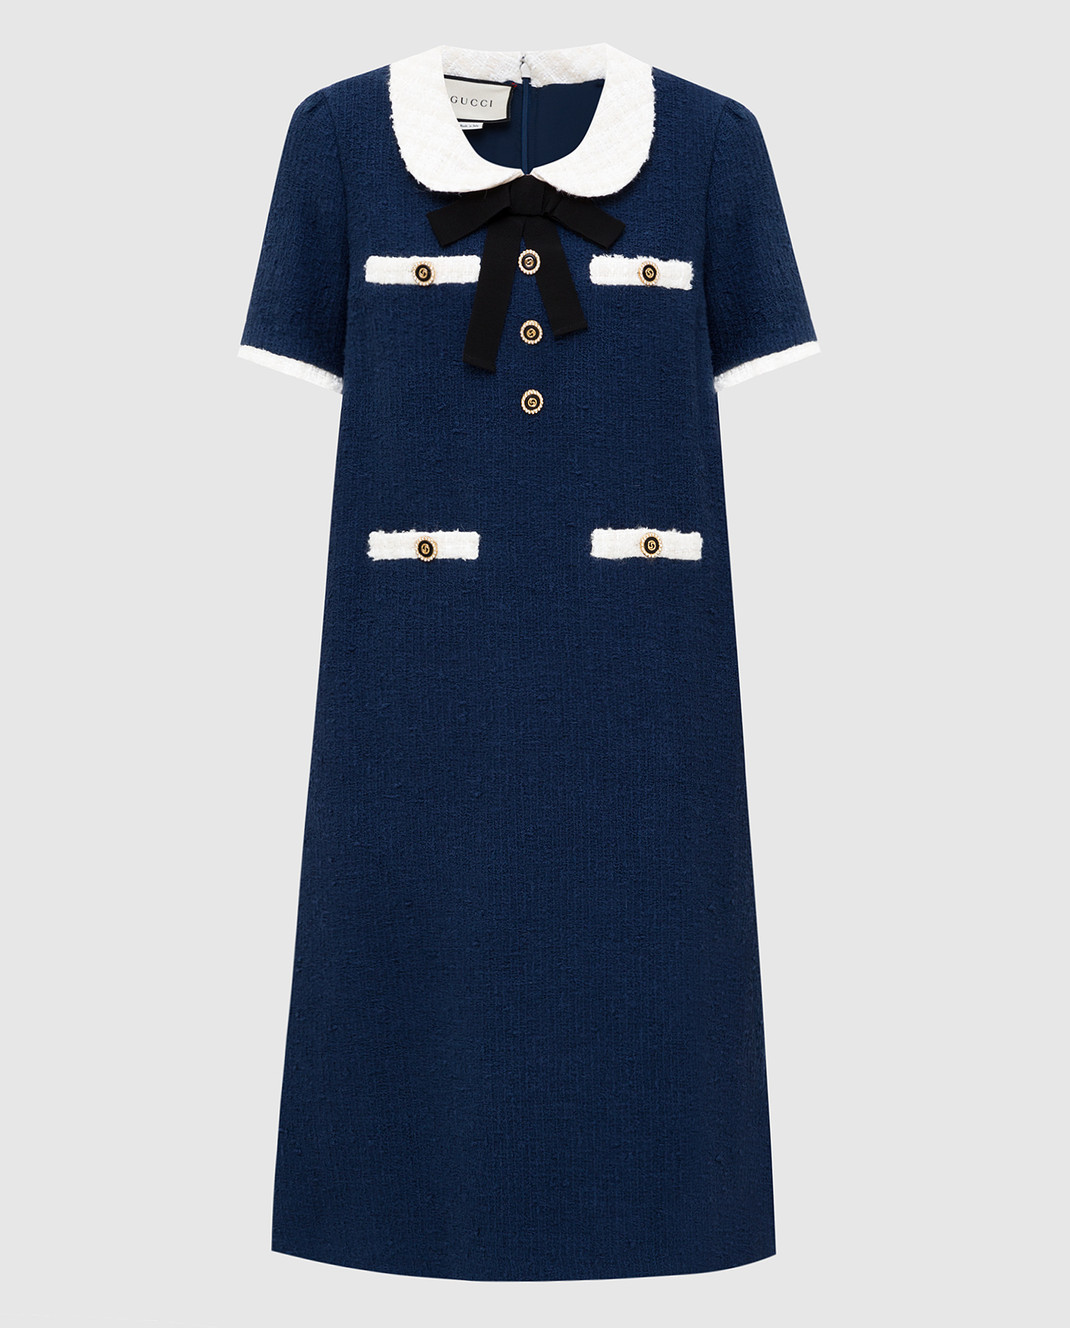 Gucci Синее платье 576826